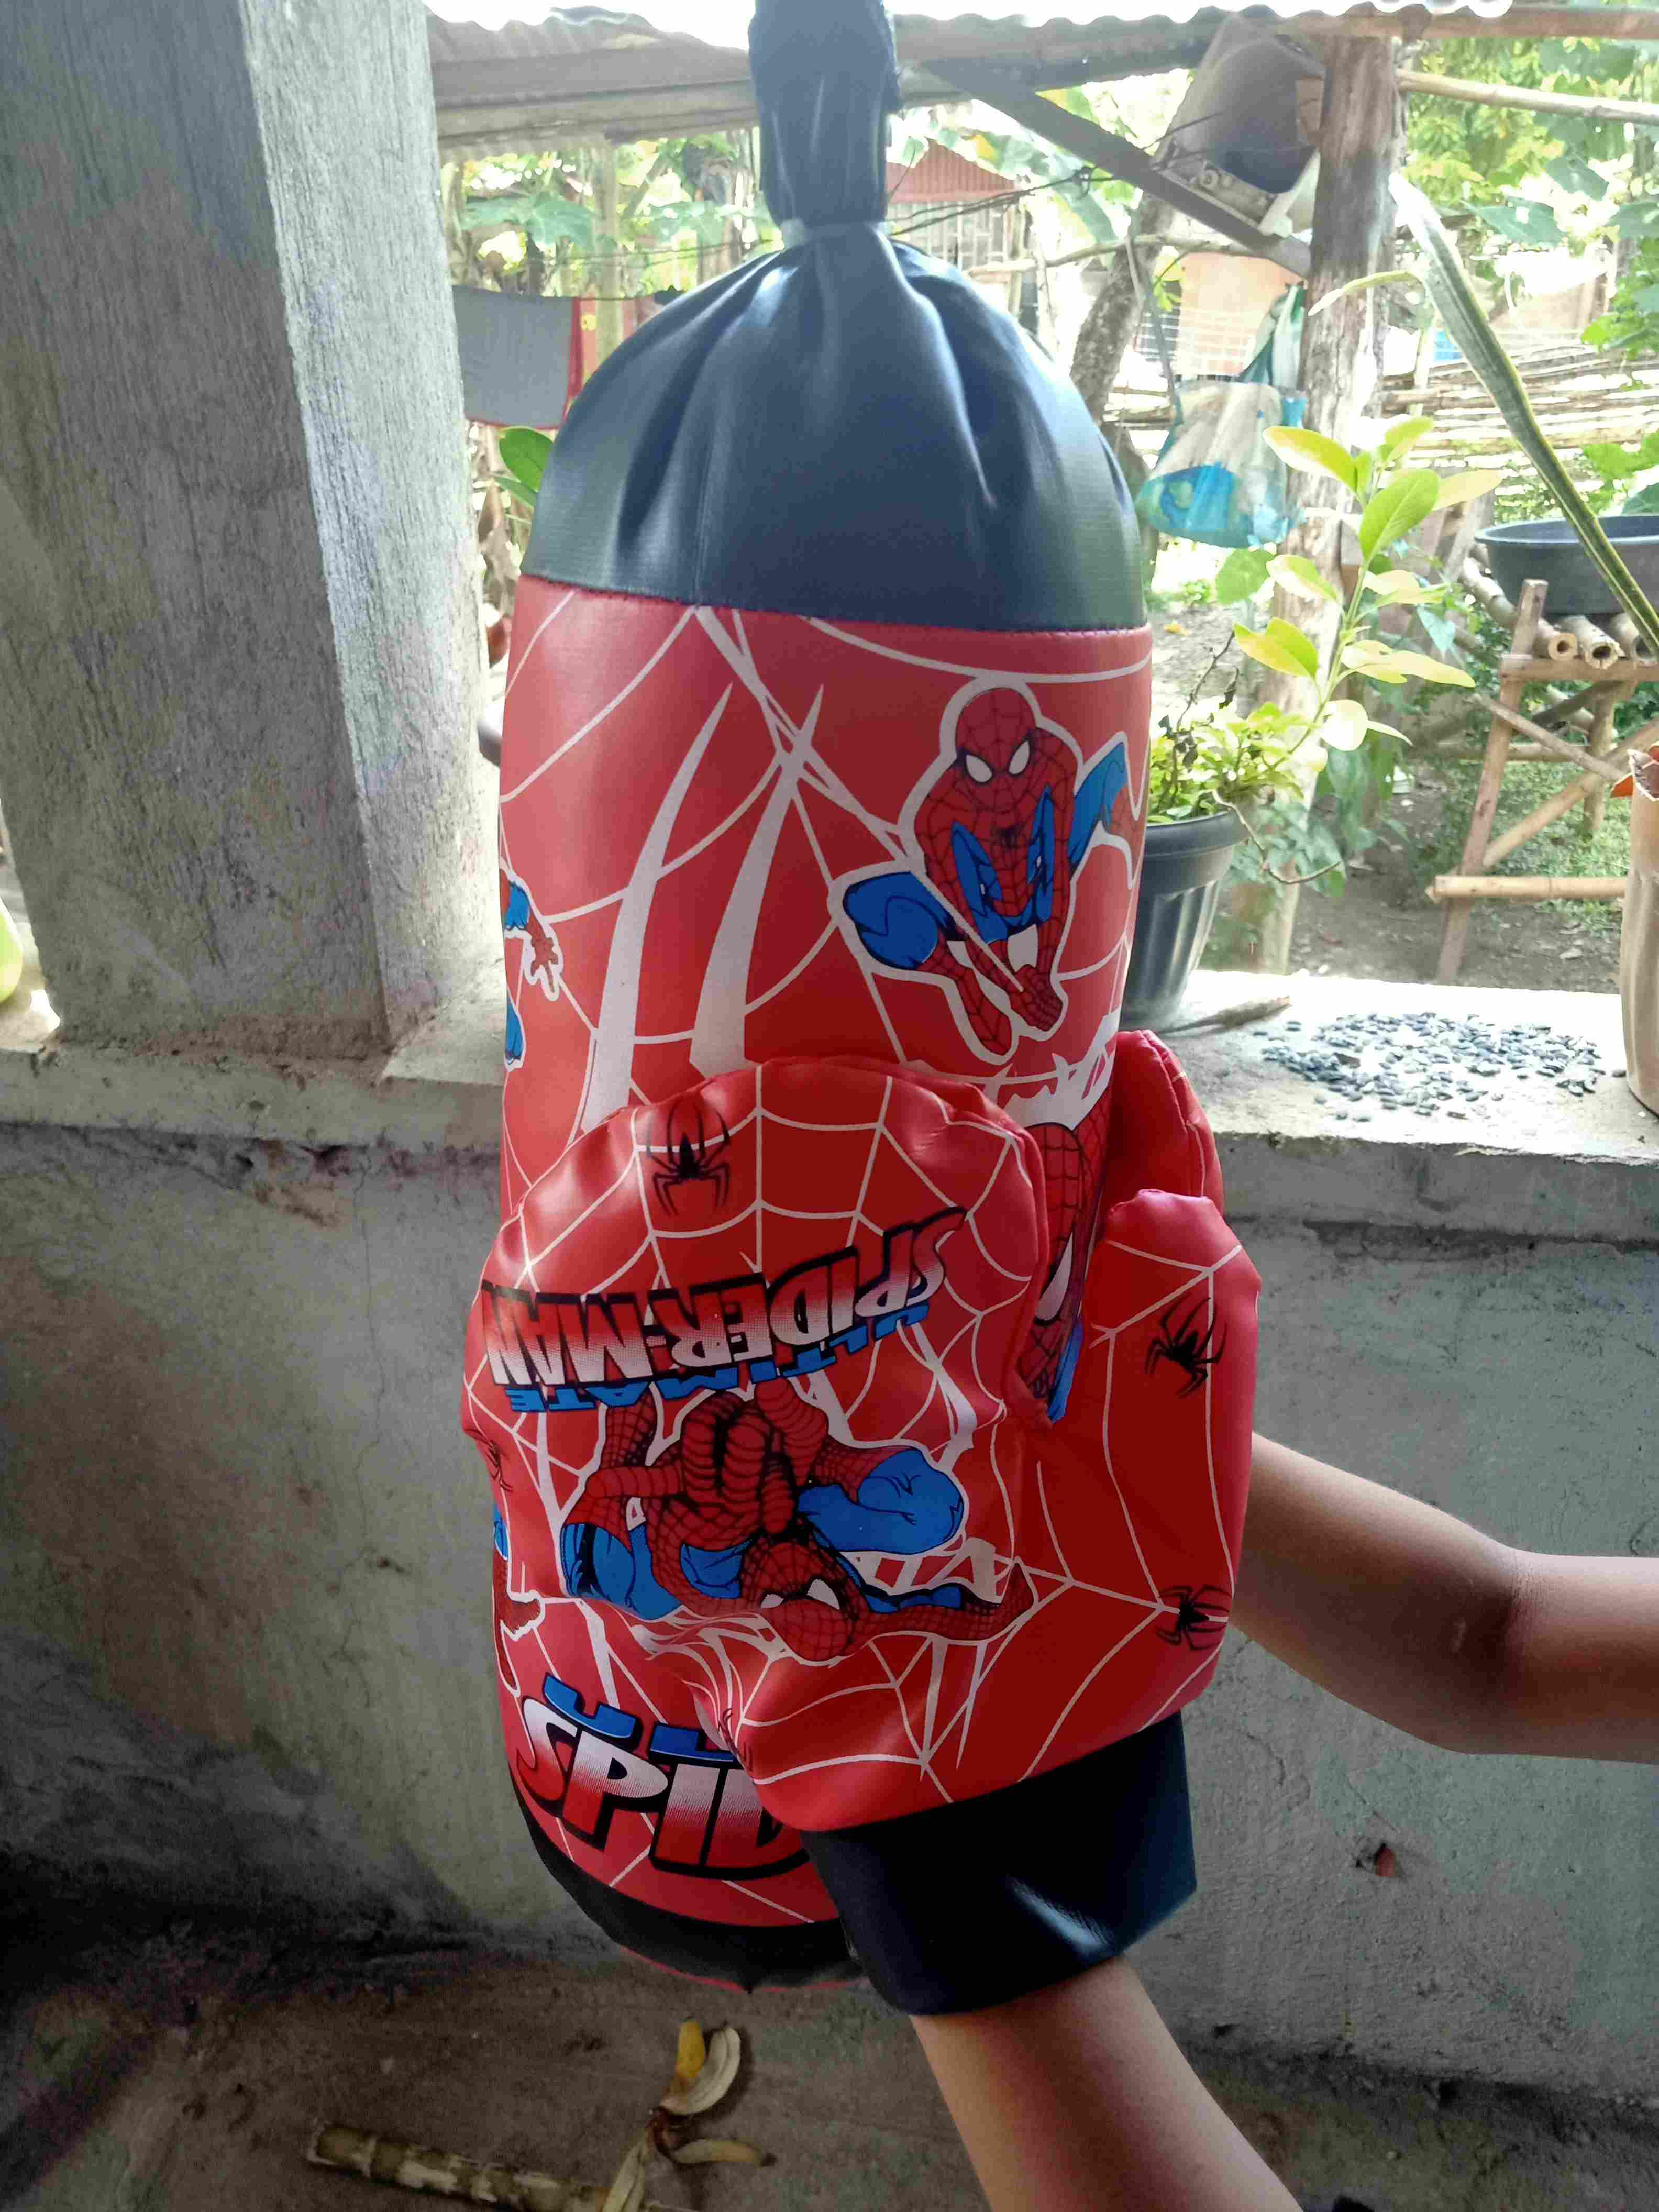 Spiderman Avengers Kids Boxing Bag Gloves Punching Set Children PVC Exercise Toy